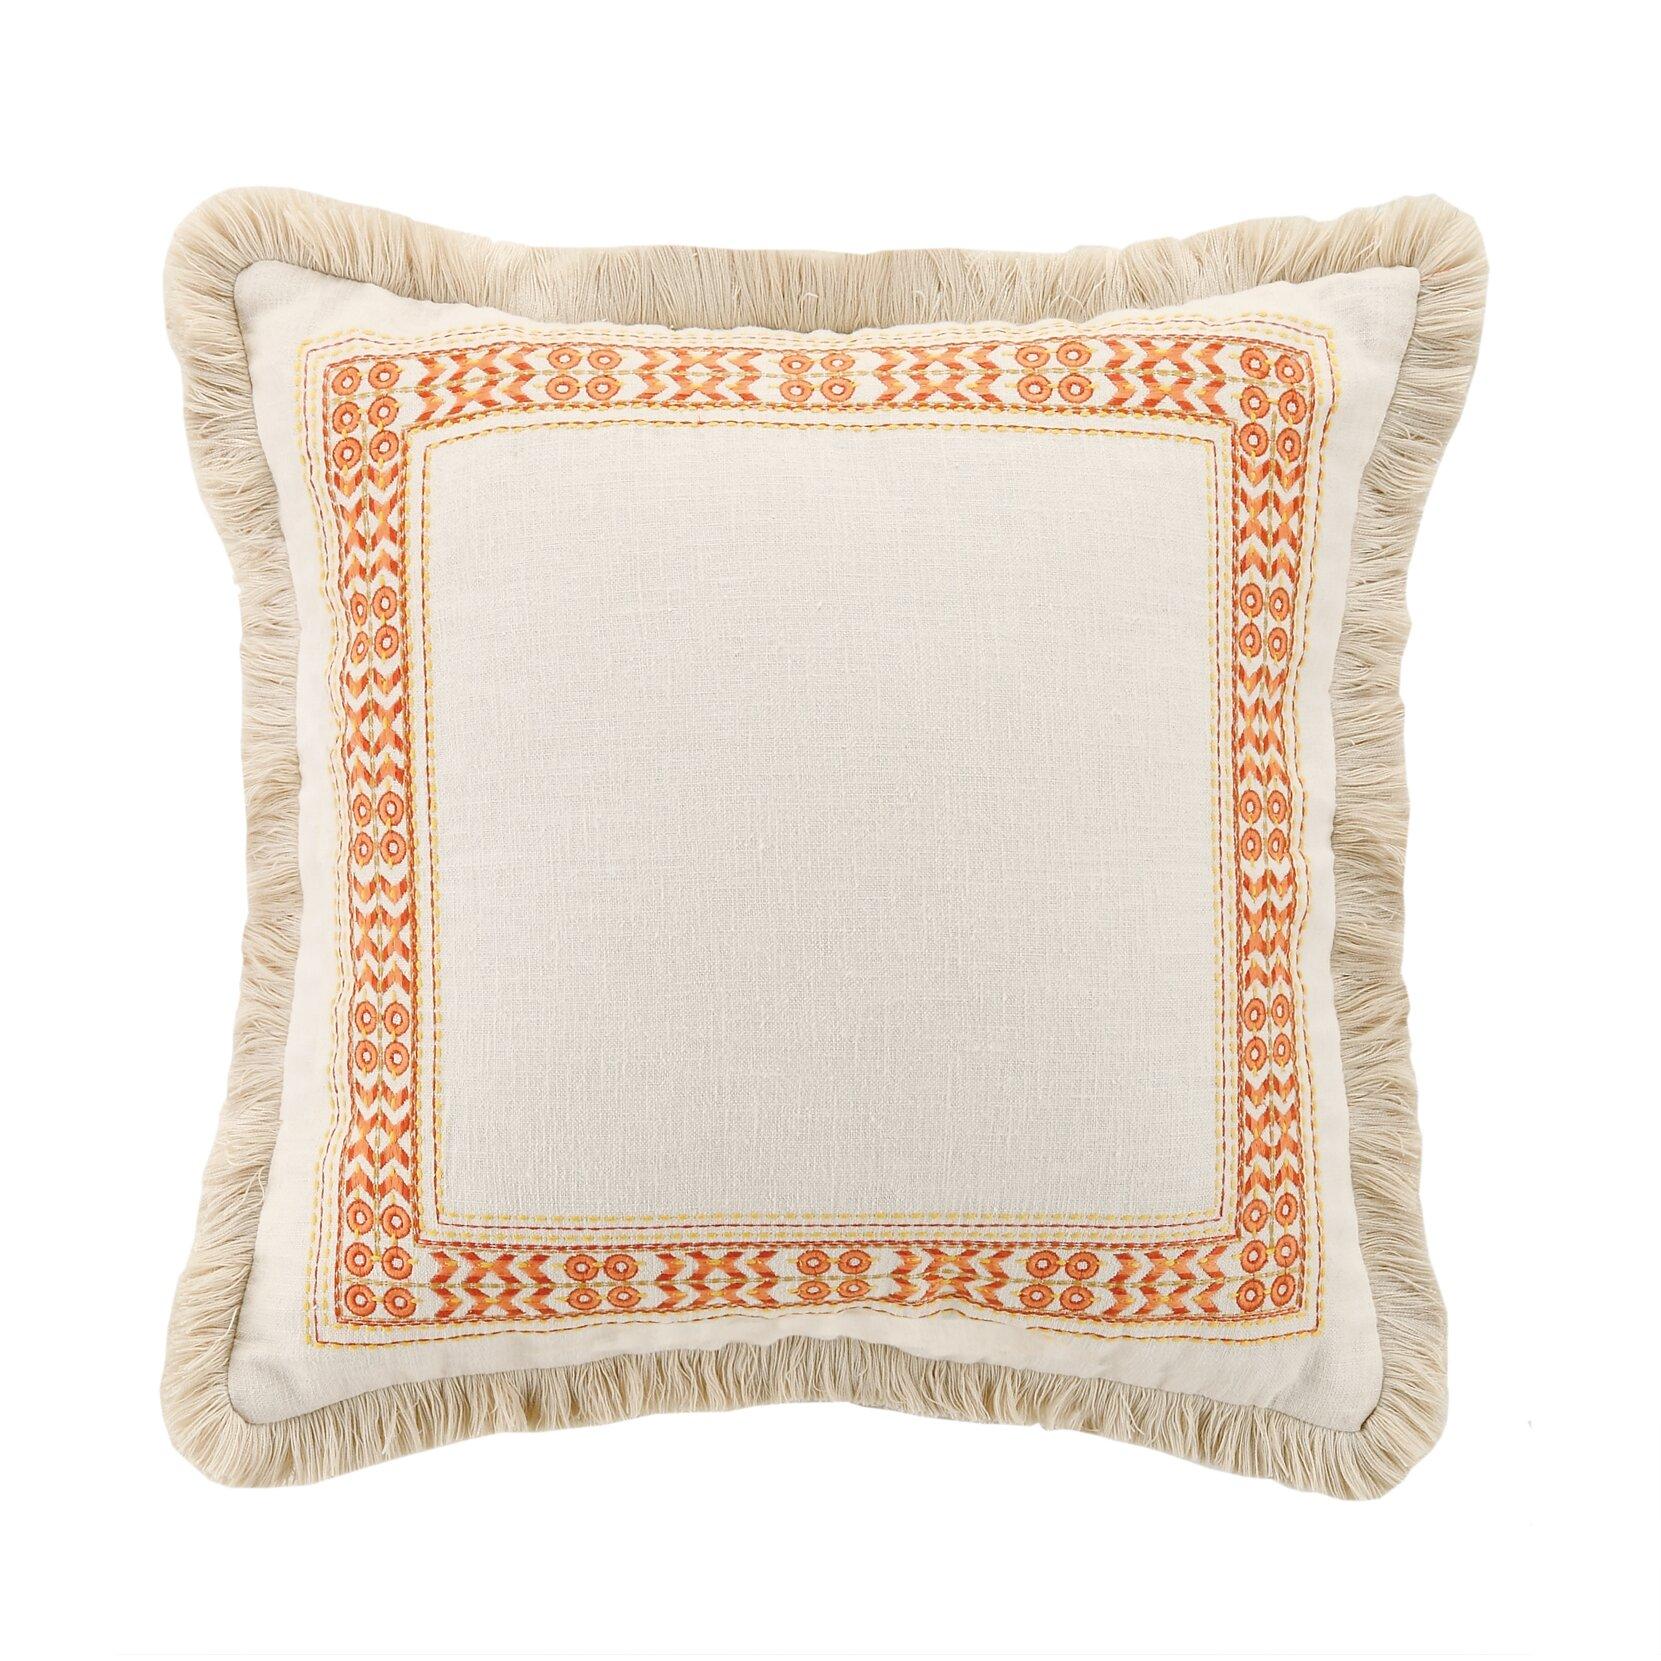 Decorative Pillows Trina Turk : Trina Turk Canoga Embroidered Linen Throw Pillow & Reviews Wayfair